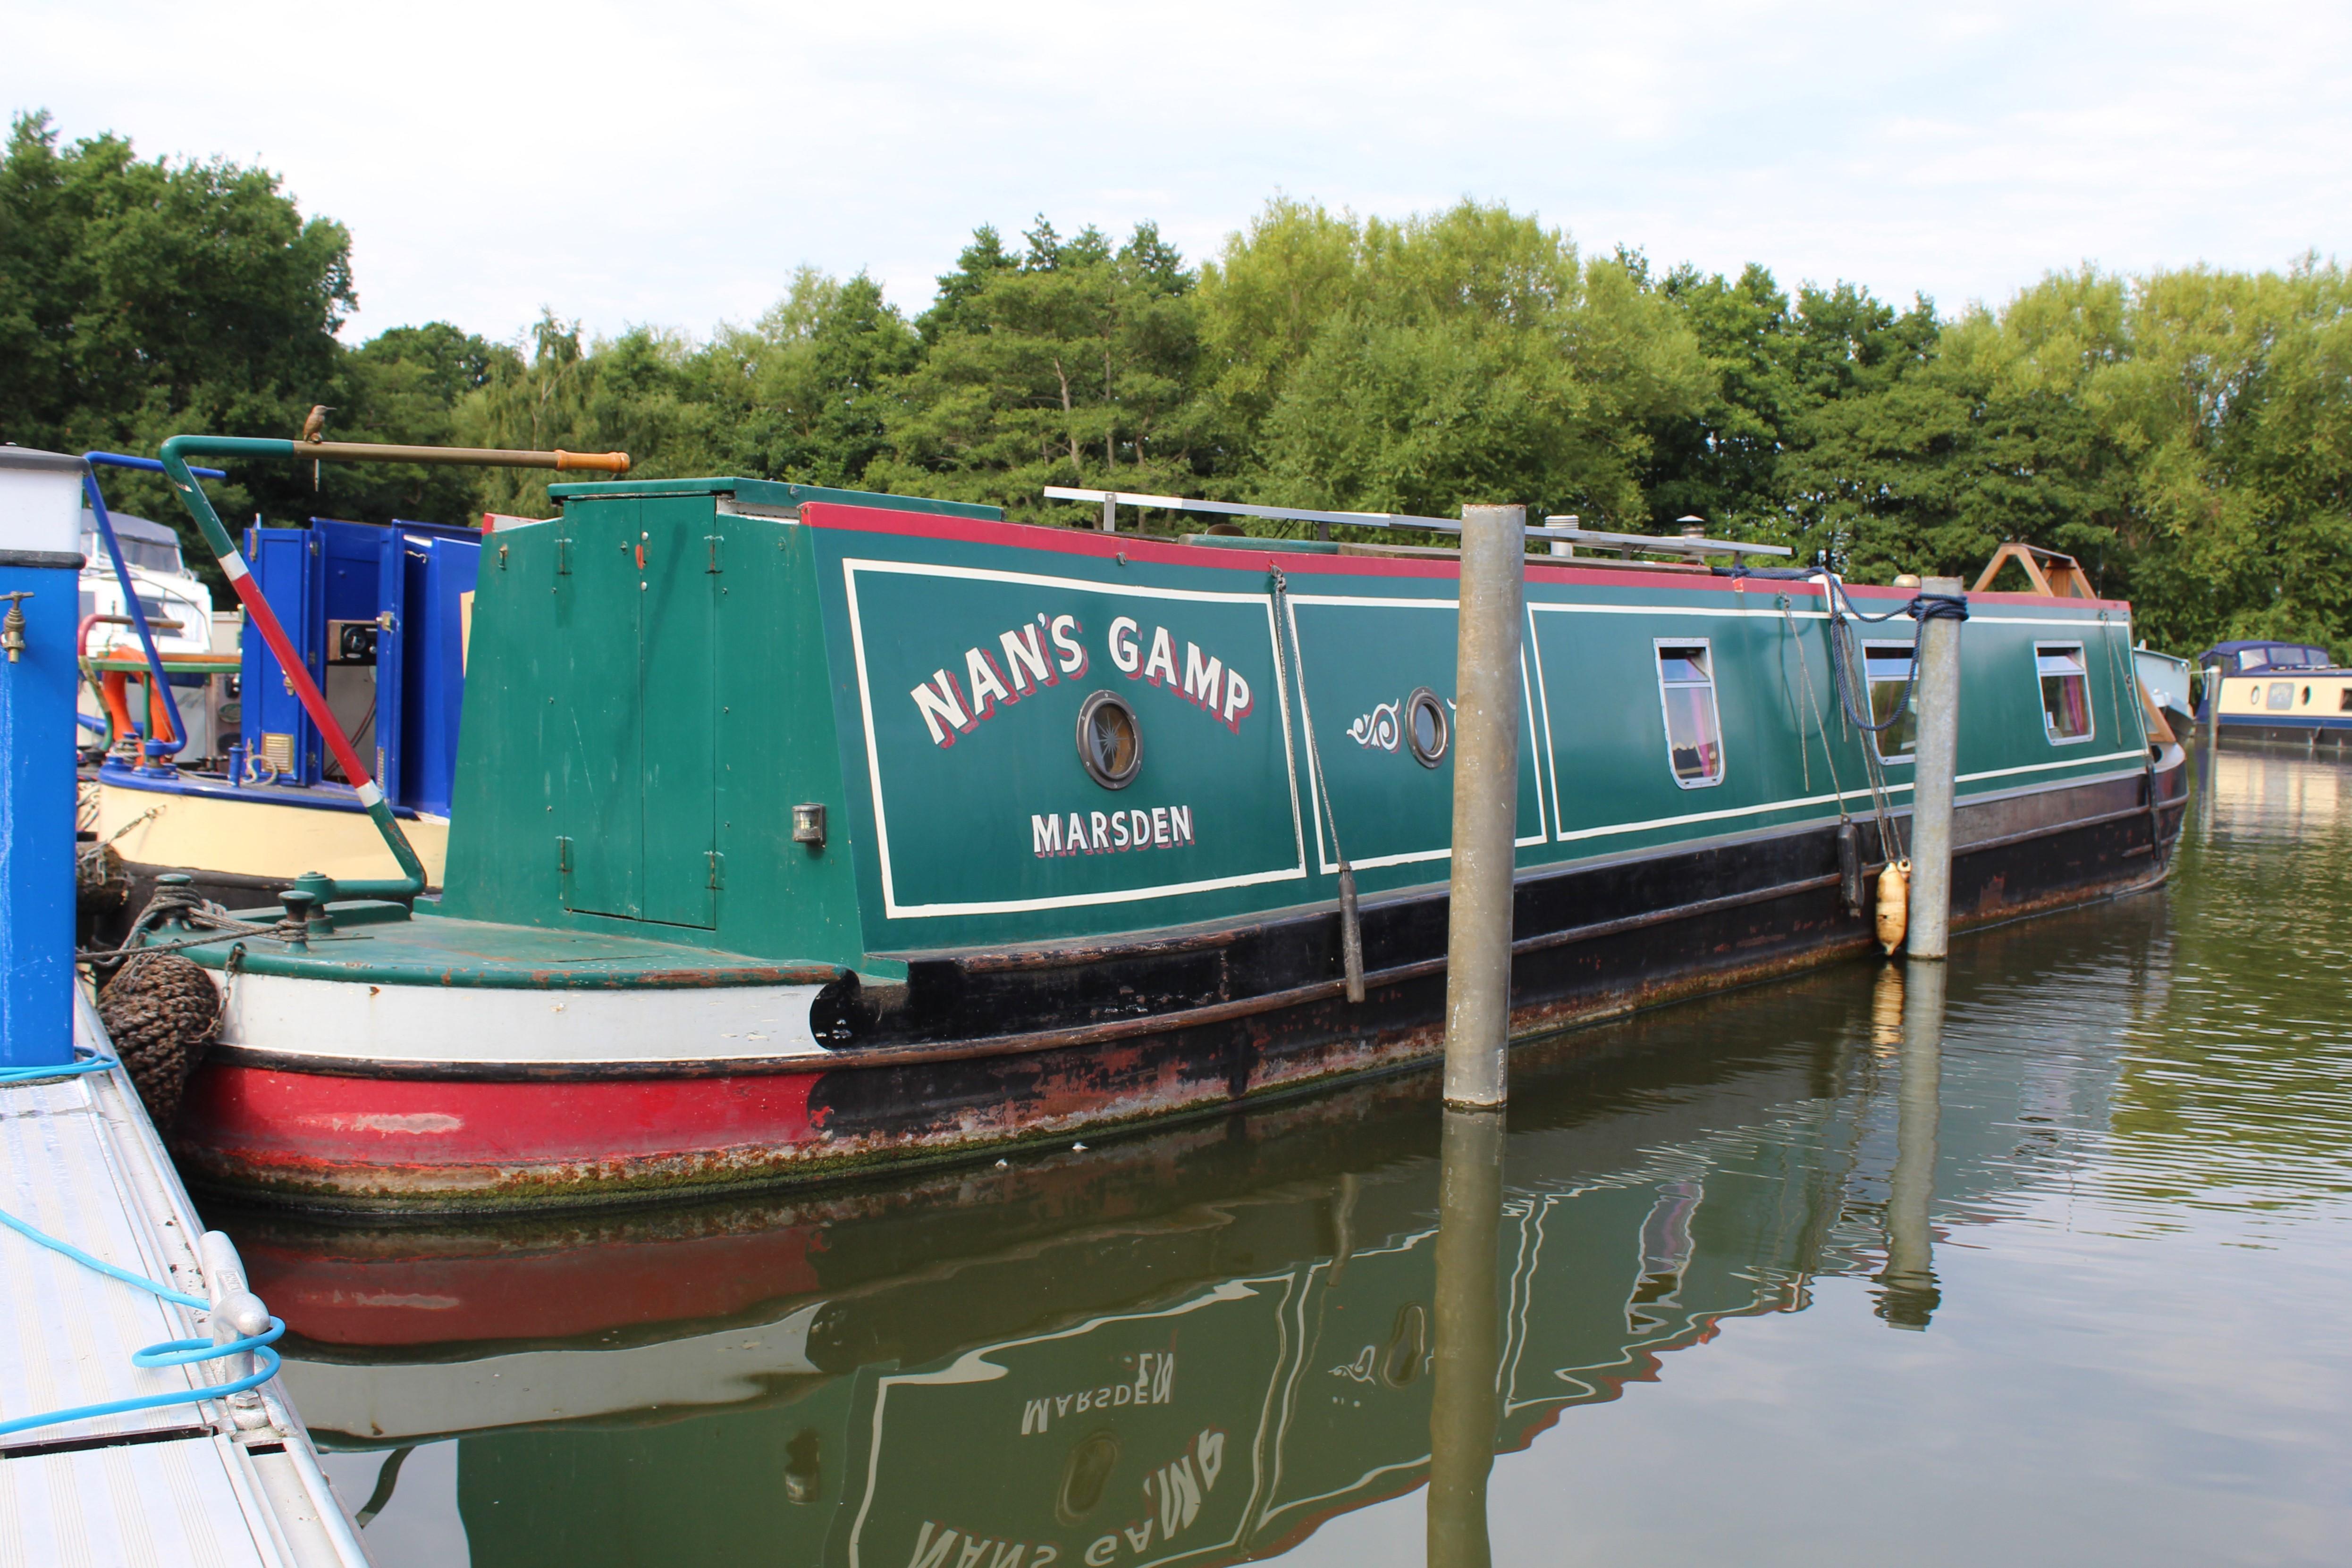 Peter Nicholls Steelboats 47' 6'' Narrowboat